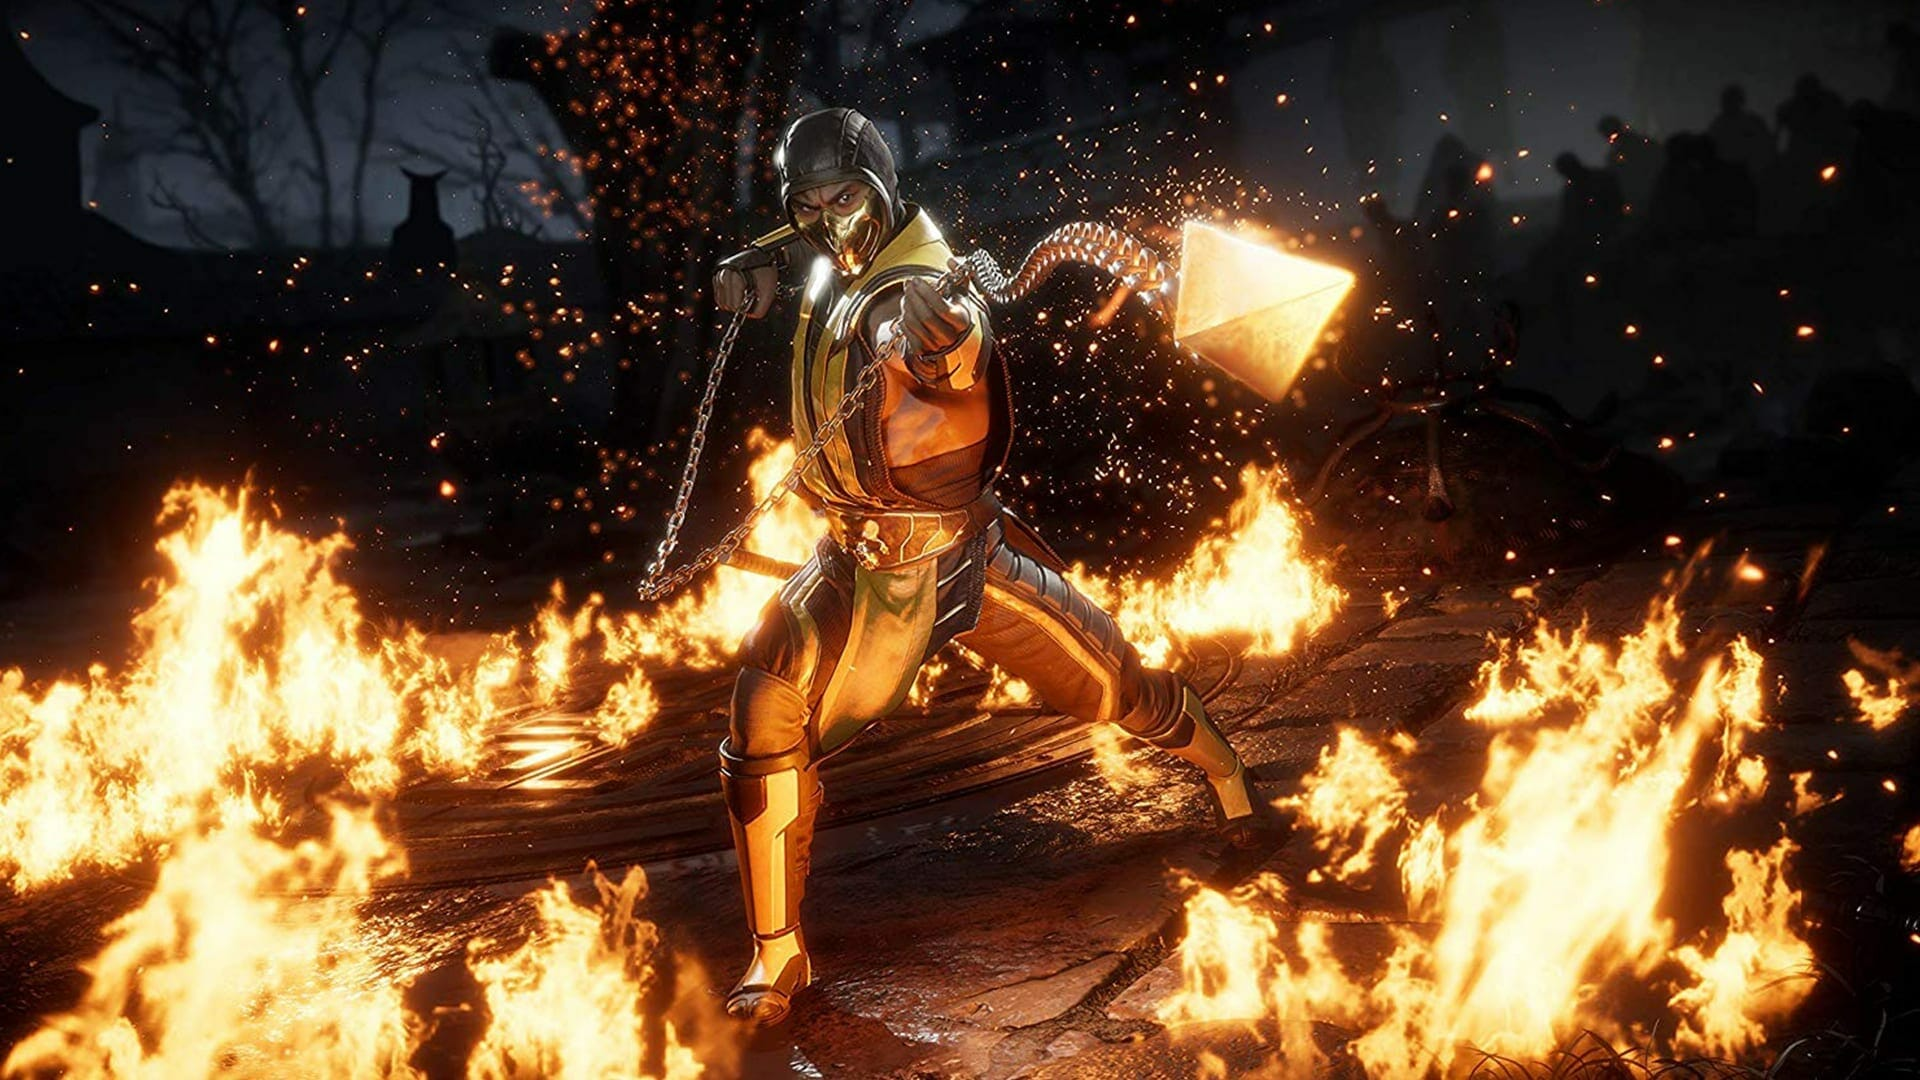 Mortal Kombat 11 Crashes